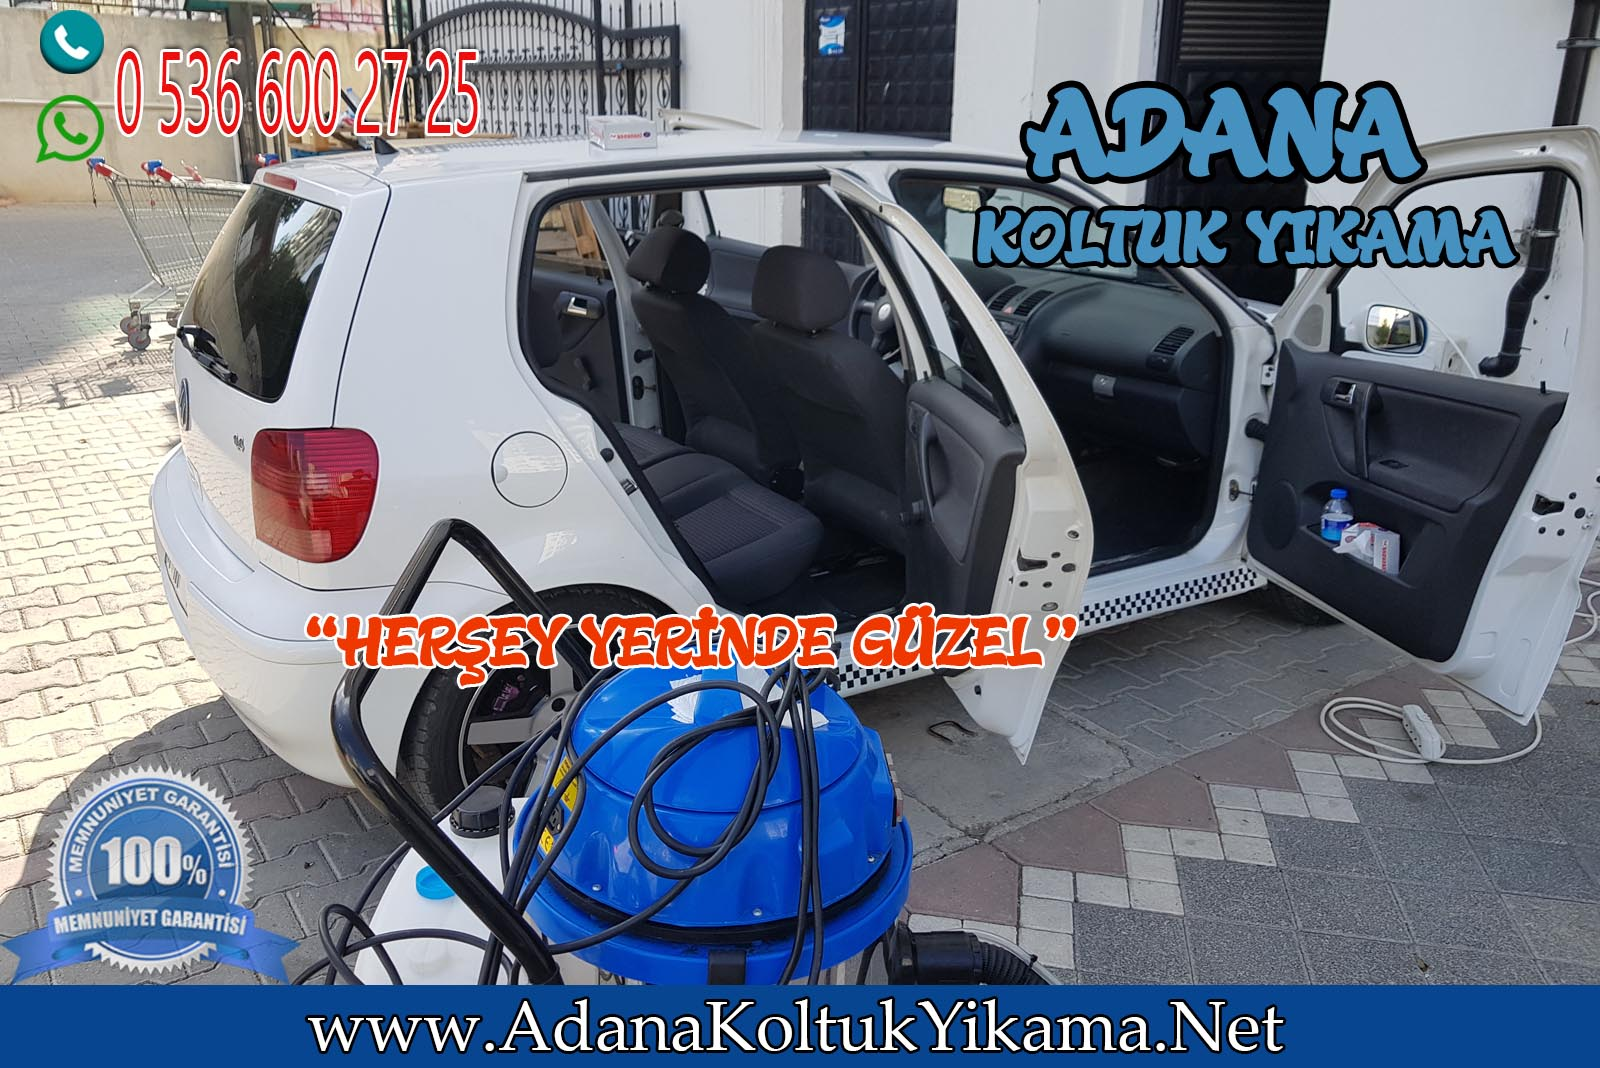 Adana Araç Koltuk Yıkama Volkswagen Polo